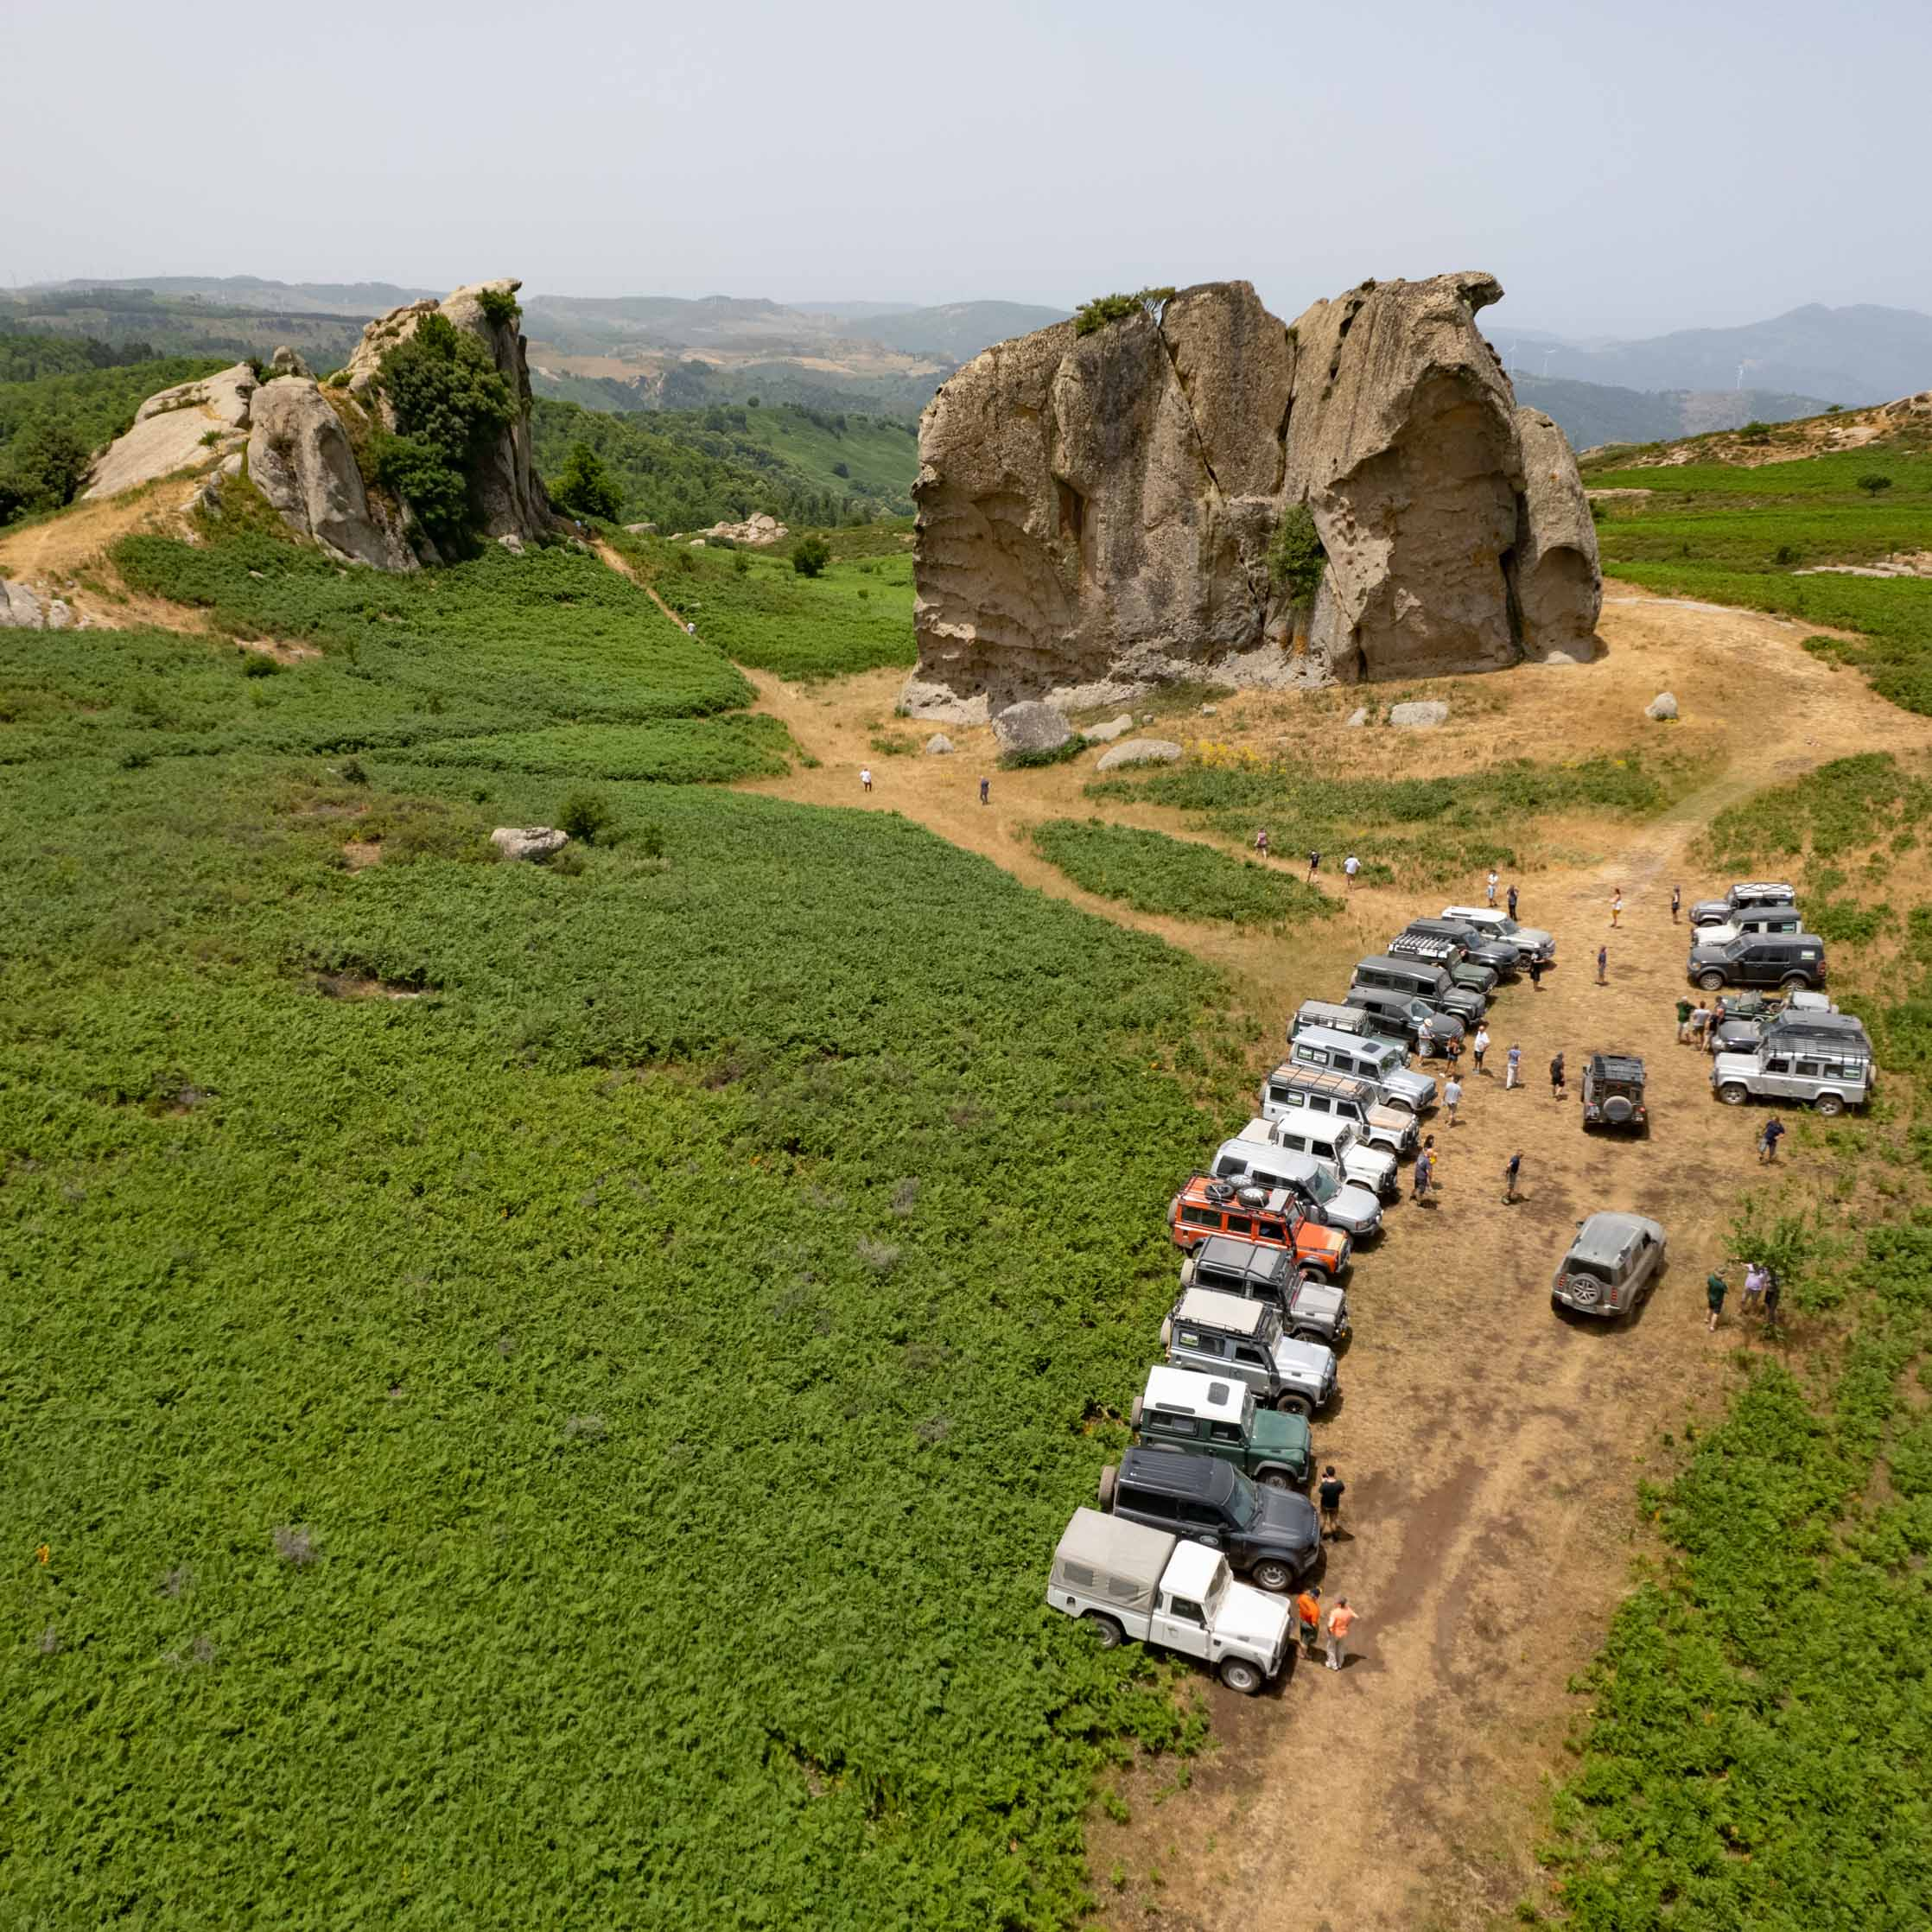 Land_Rover_Tour_Sicilia_2021_Land_Rover_Experience_Italia_-32